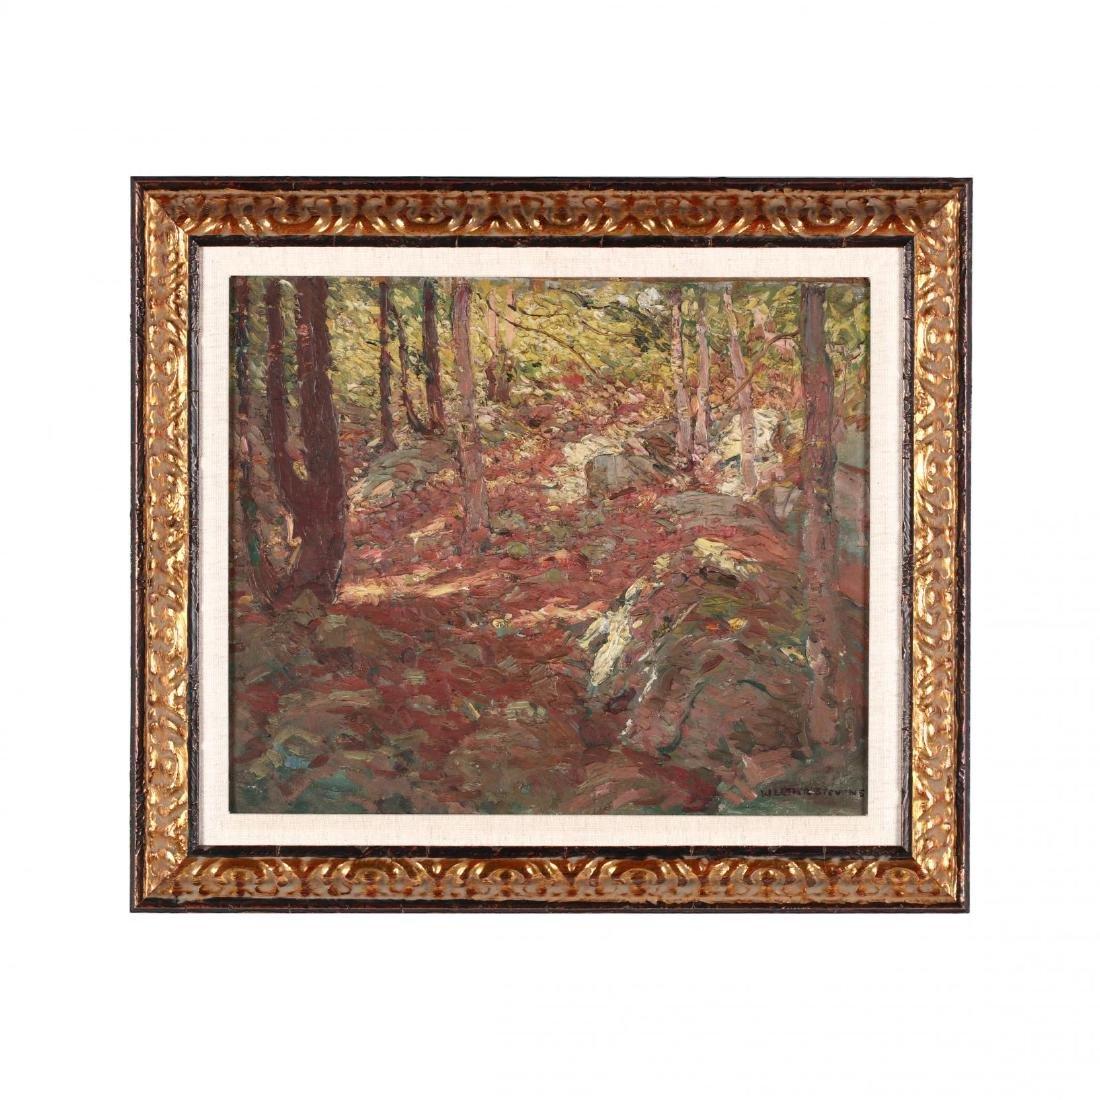 William Lester Stevens (MA, 1888-1969), Forest Interior